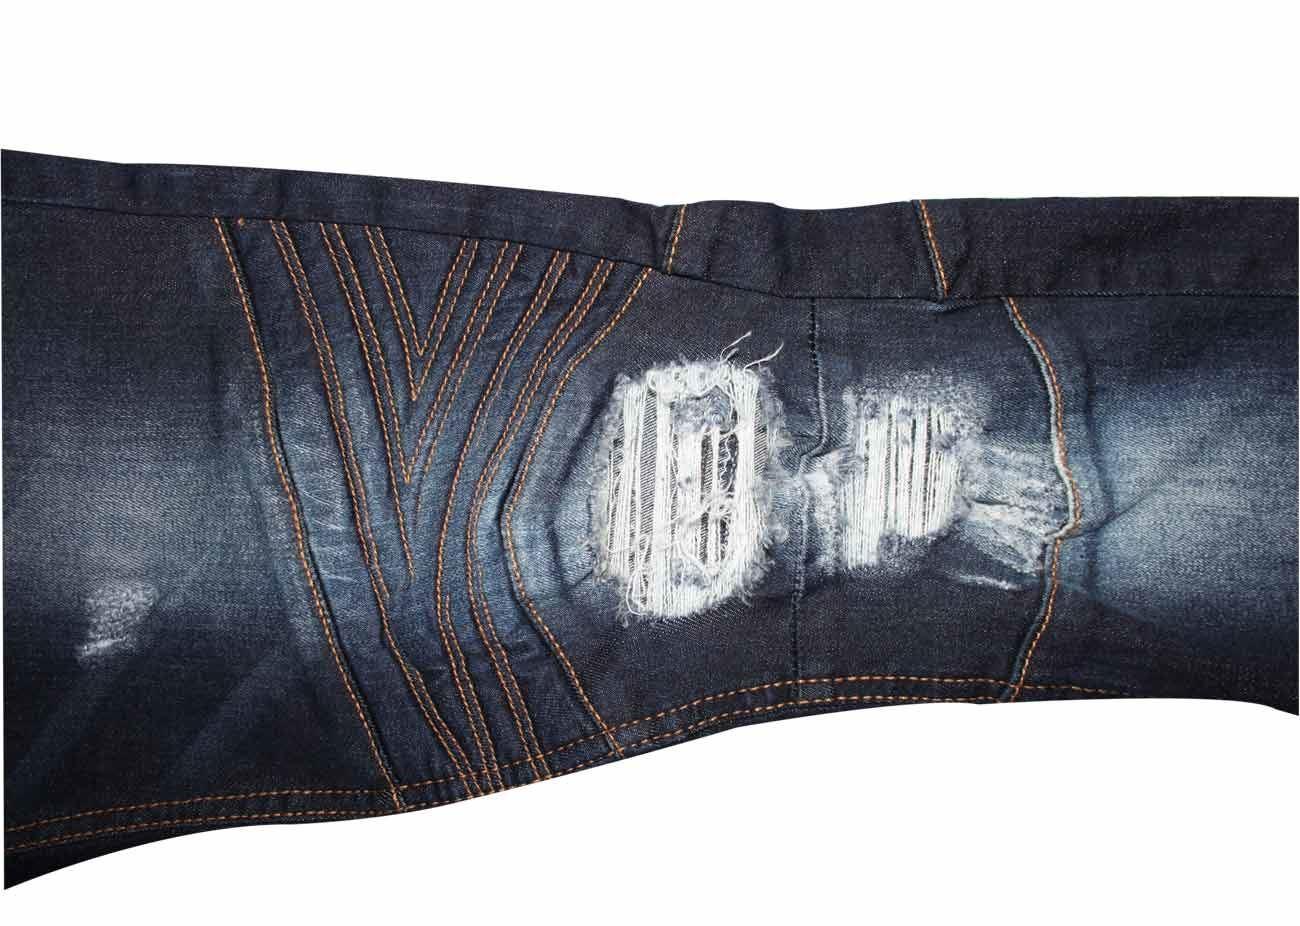 Para-Hombre-Biker-Skinny-Jeans-lealtad-amp-Faith-Slim-Fit-Pantalones-Ajustados-Pantalones-rasgada miniatura 20